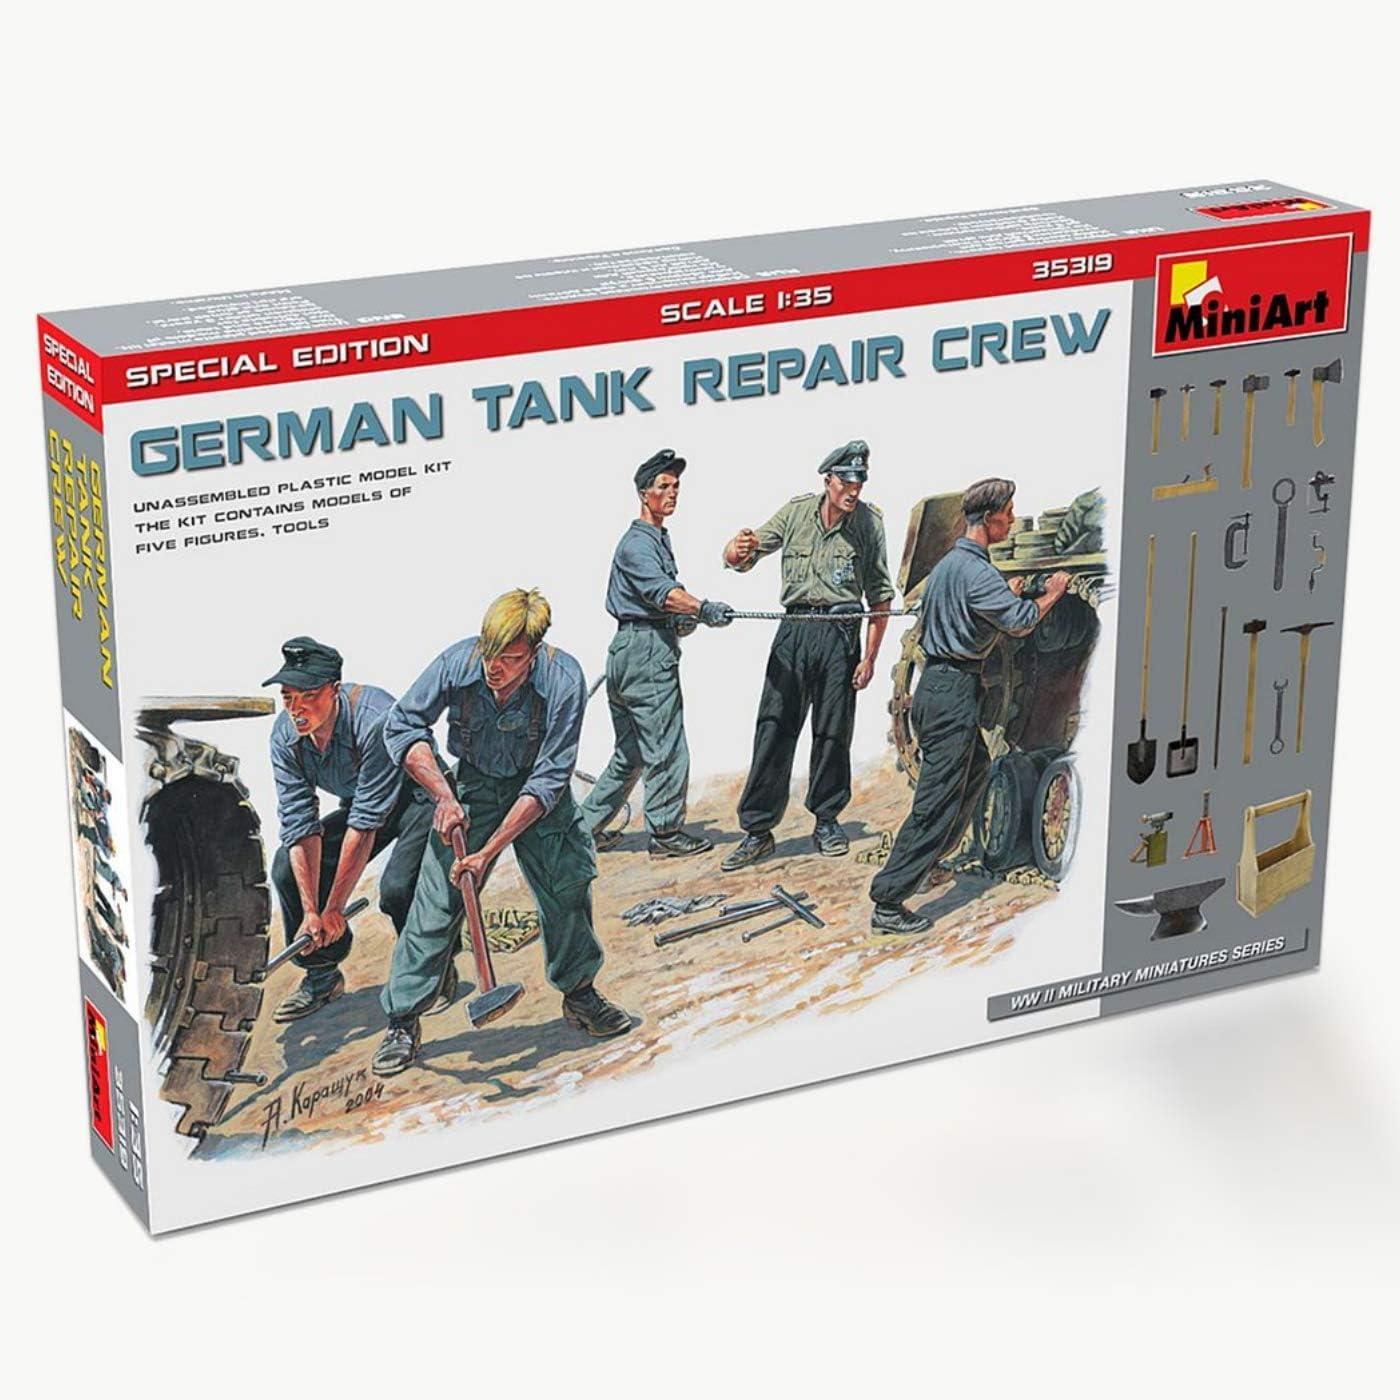 1//35 Resin German Tank Crew 2 Kit at Rest unpainted unassembled 1214